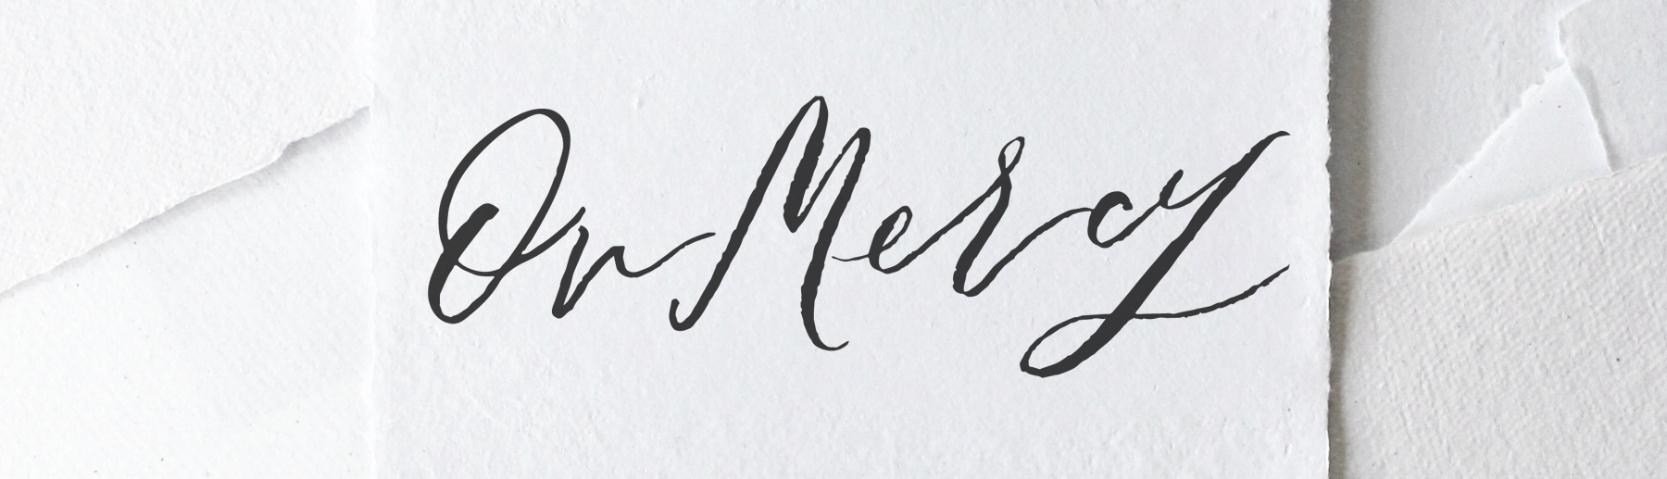 On_Mercy-cover2.jpg